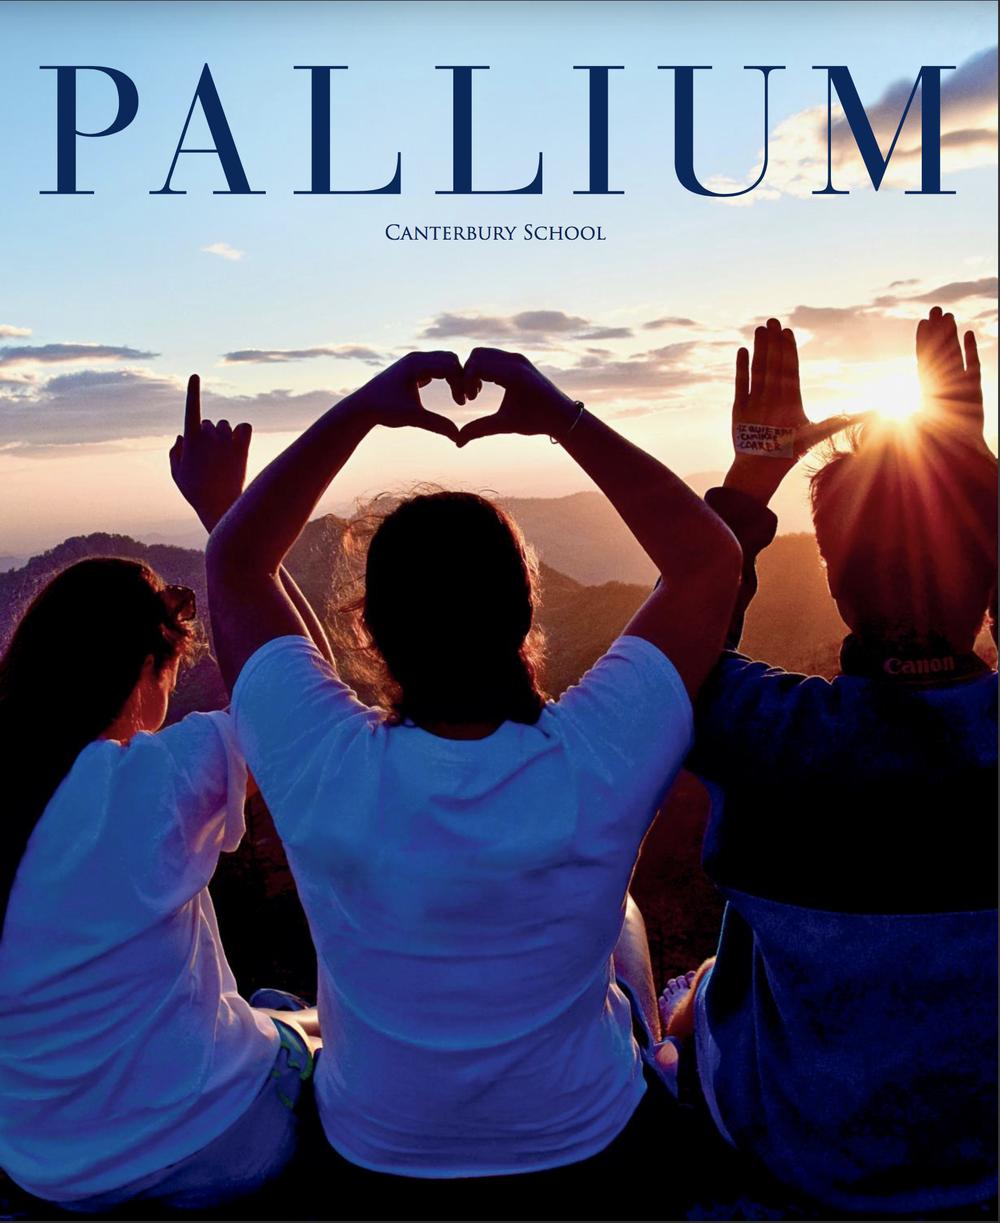 kelsh-wilson-design-canterbury-school-pallium-cover.png